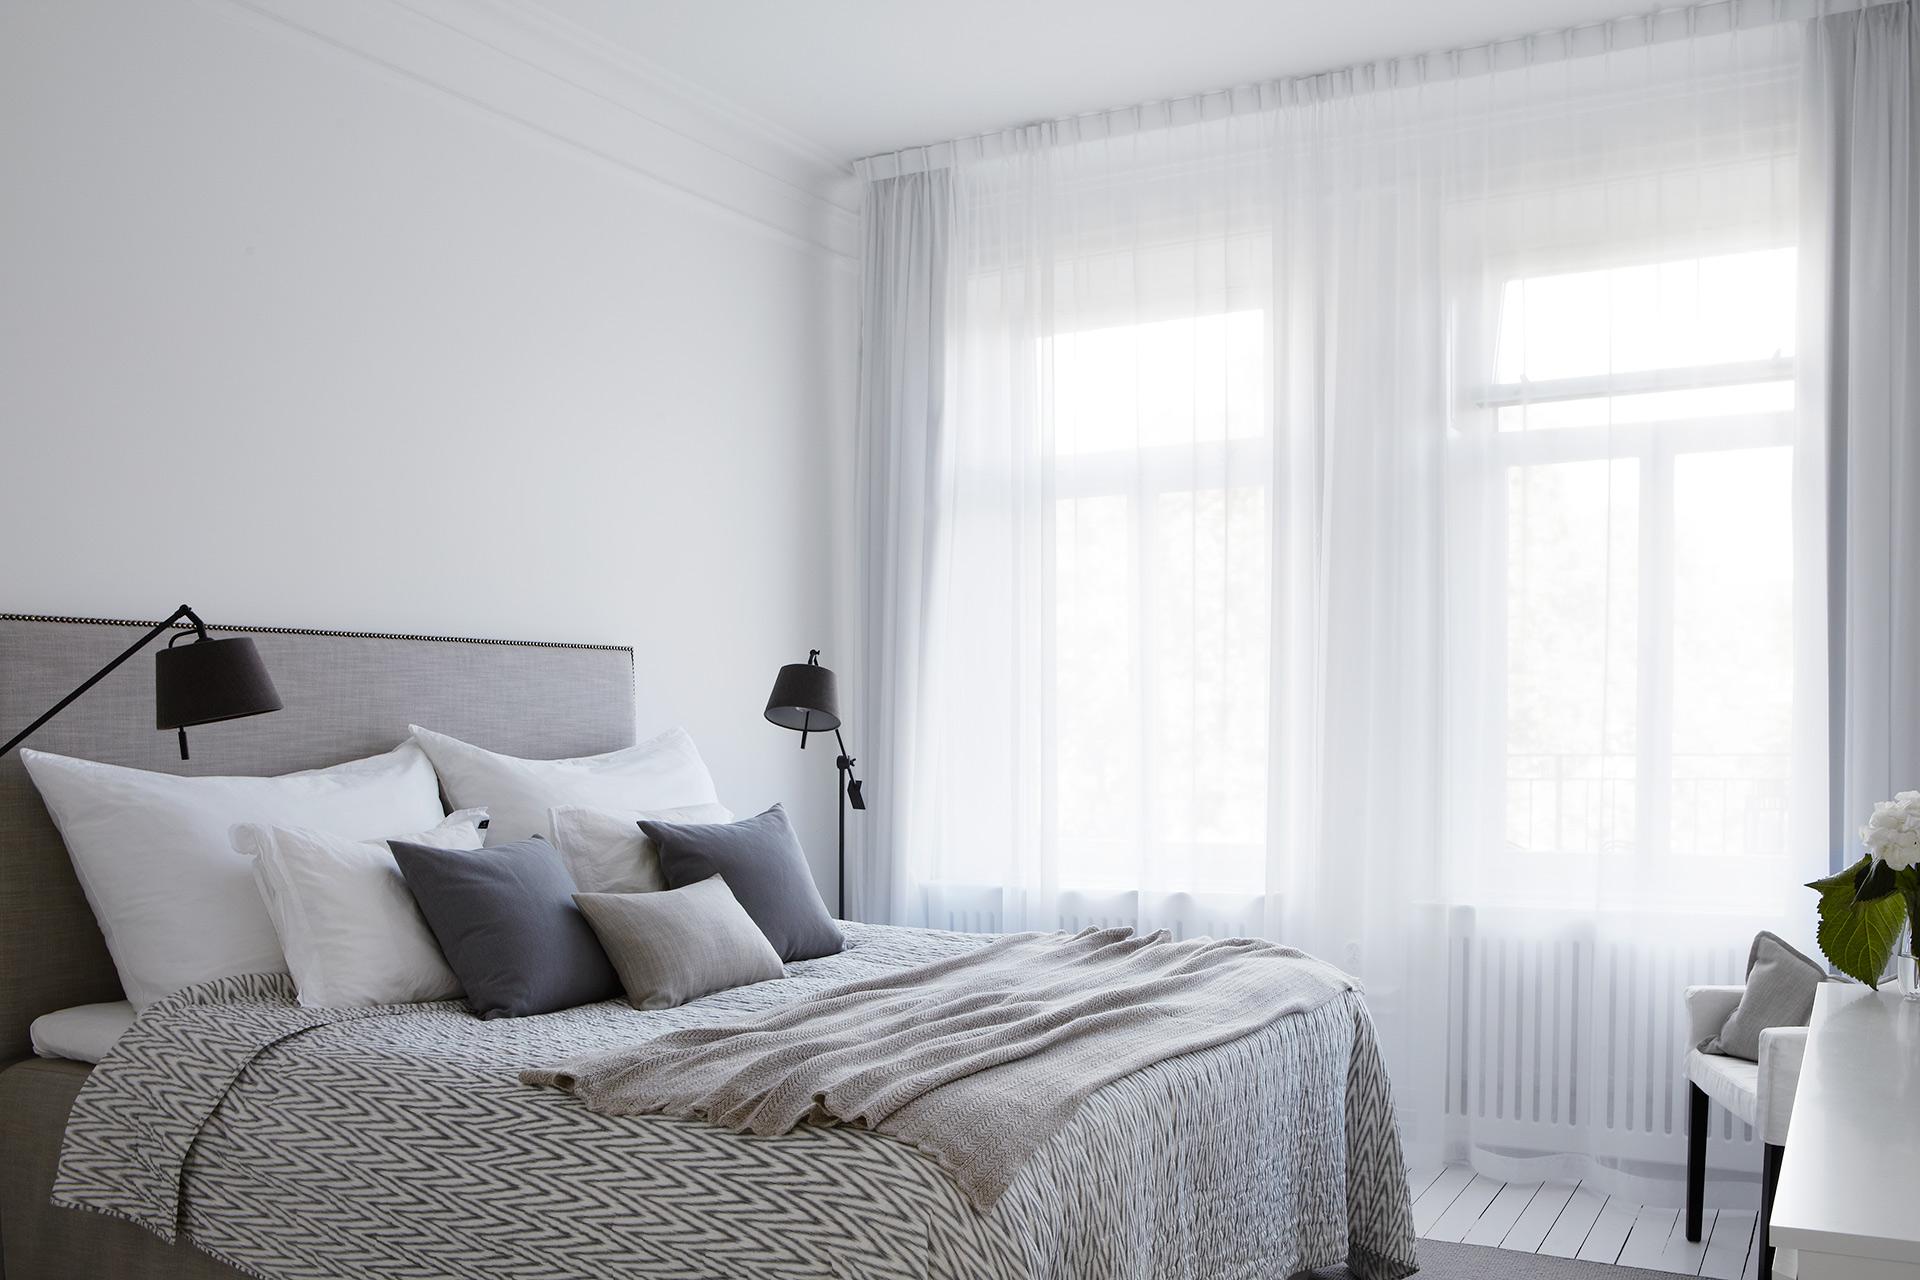 inreda grått sovrum